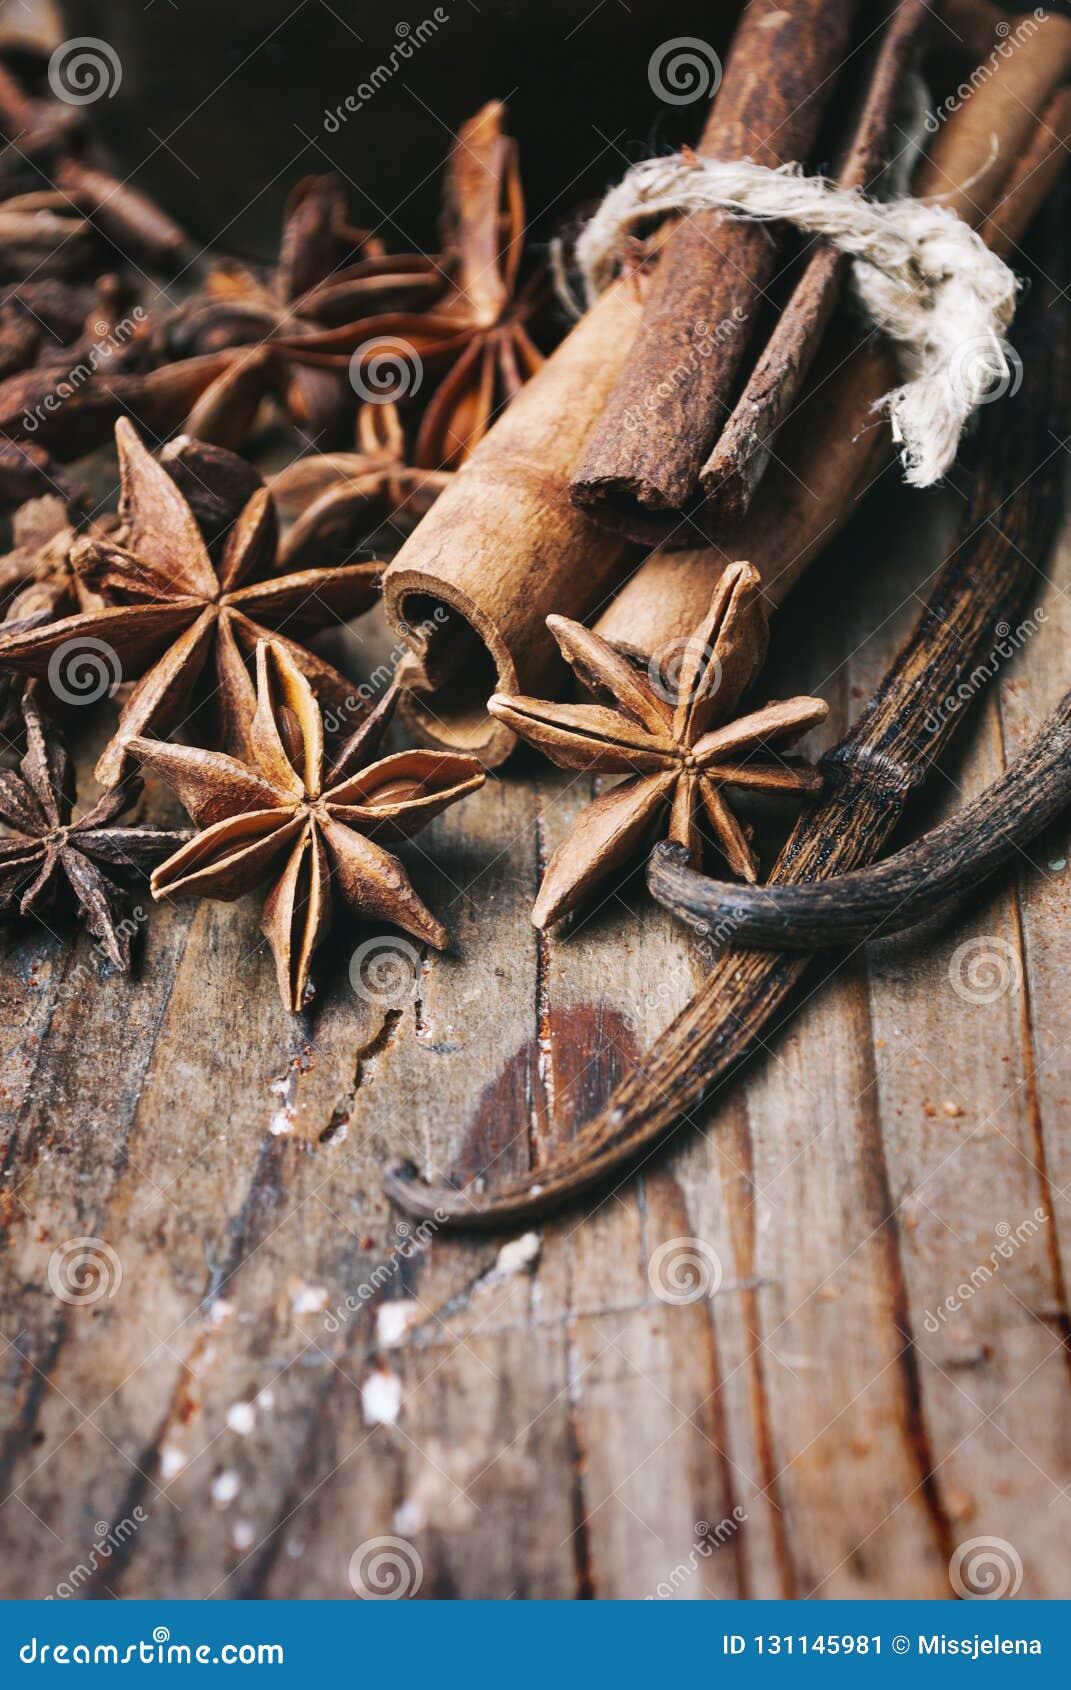 Closeup Of Anise Seed Vanilla And Cinnamon Sticks On Rustic